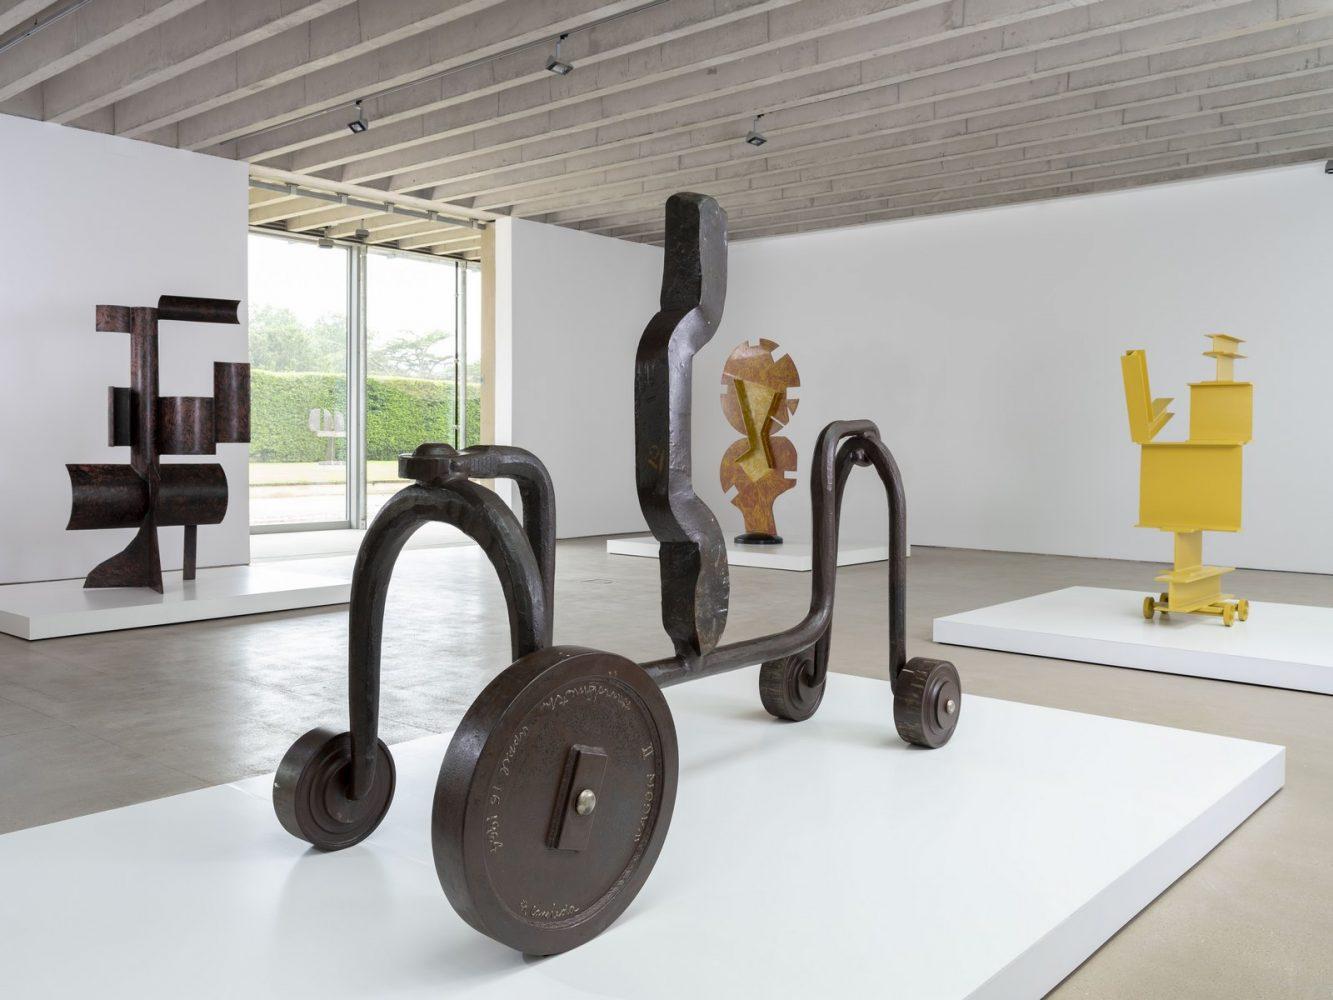 Image 13_David Smith, Sculpture 1932-1965 © 2019 Photo © Jonty Wilde 17.6.19-989